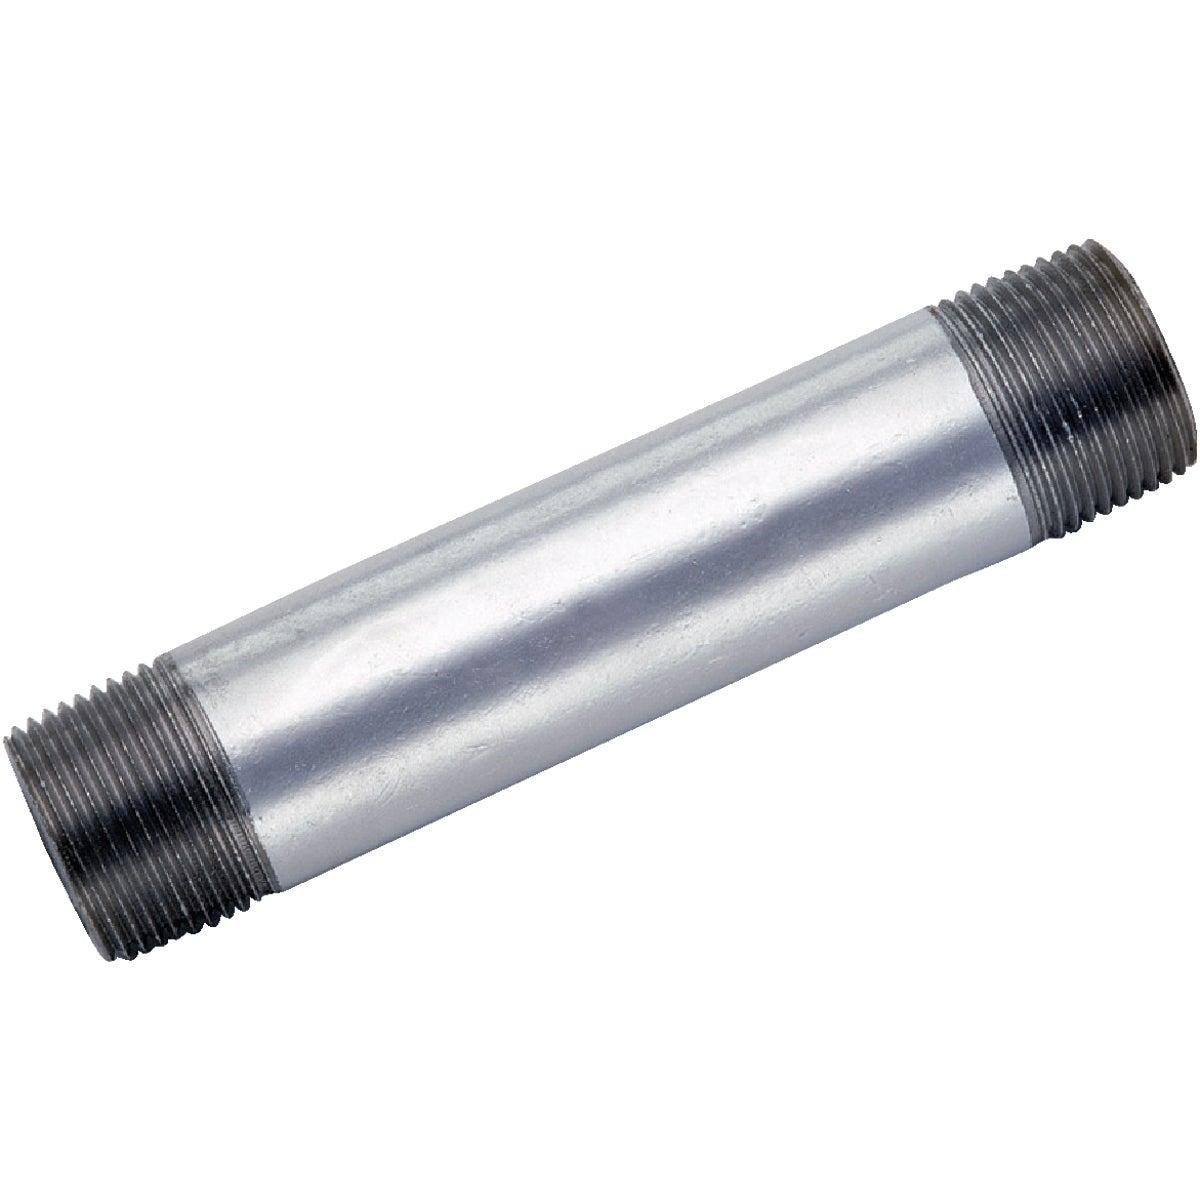 2X7 GALV NIPPLE - 8700155602 by Anvil International